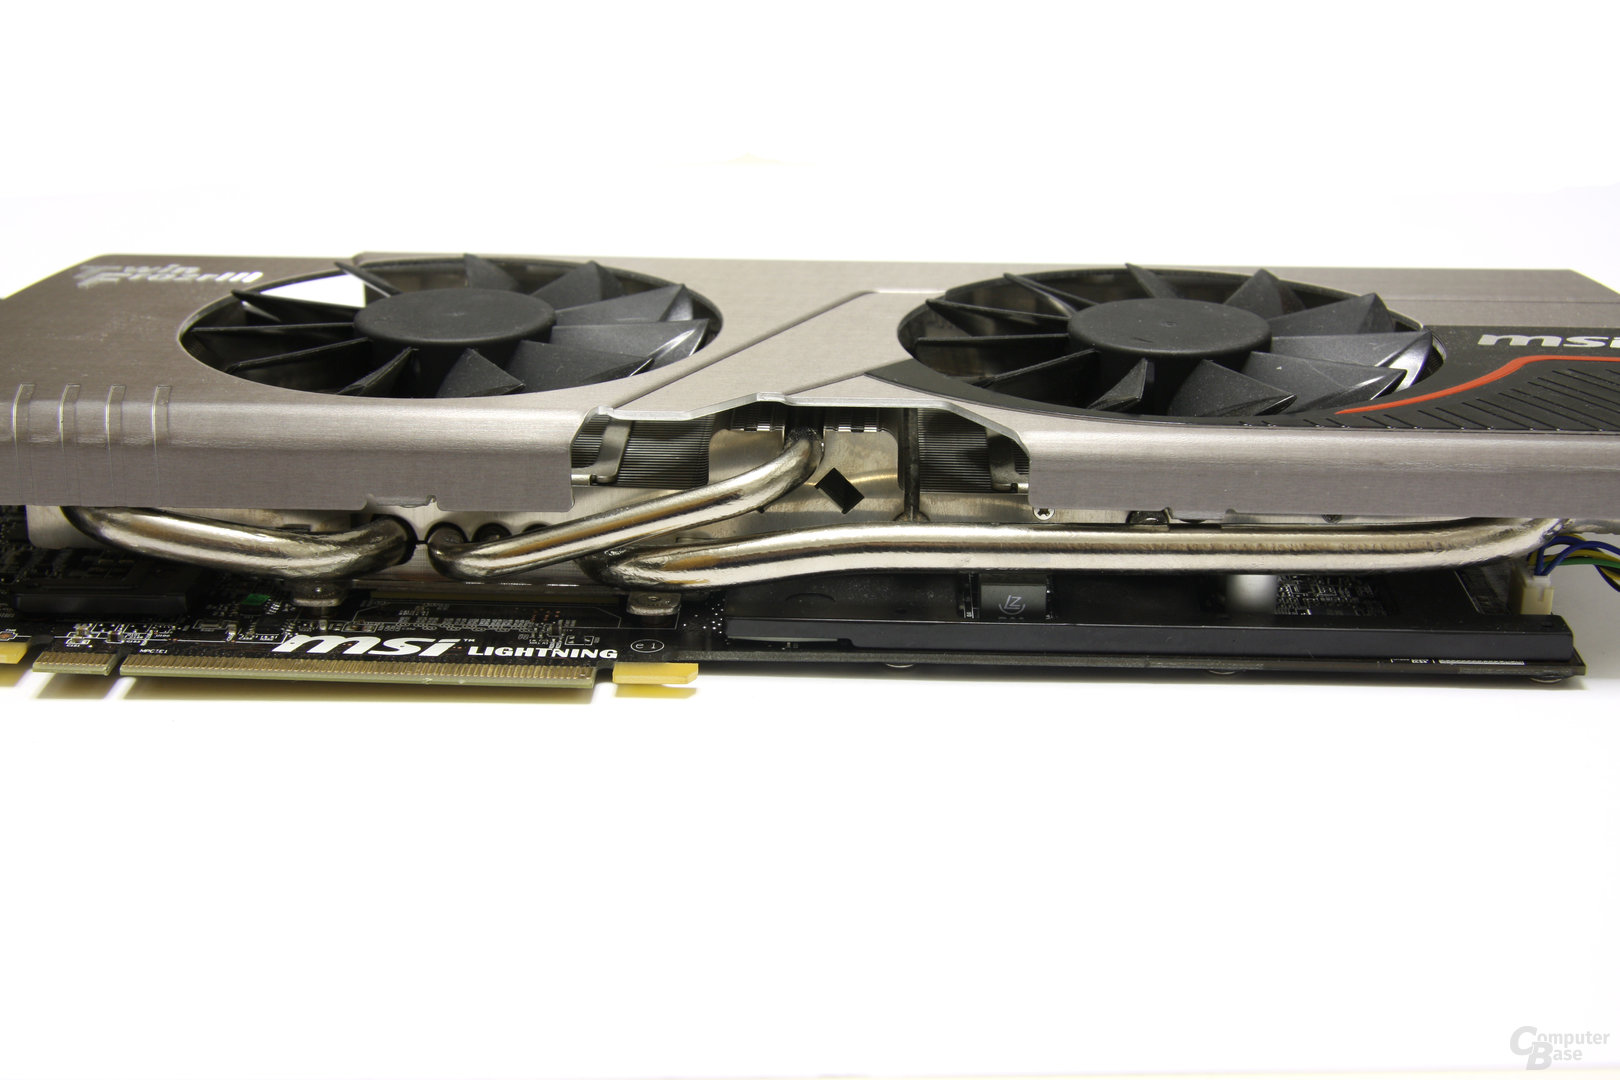 Radeon HD 6970 Lightning Heatpipes